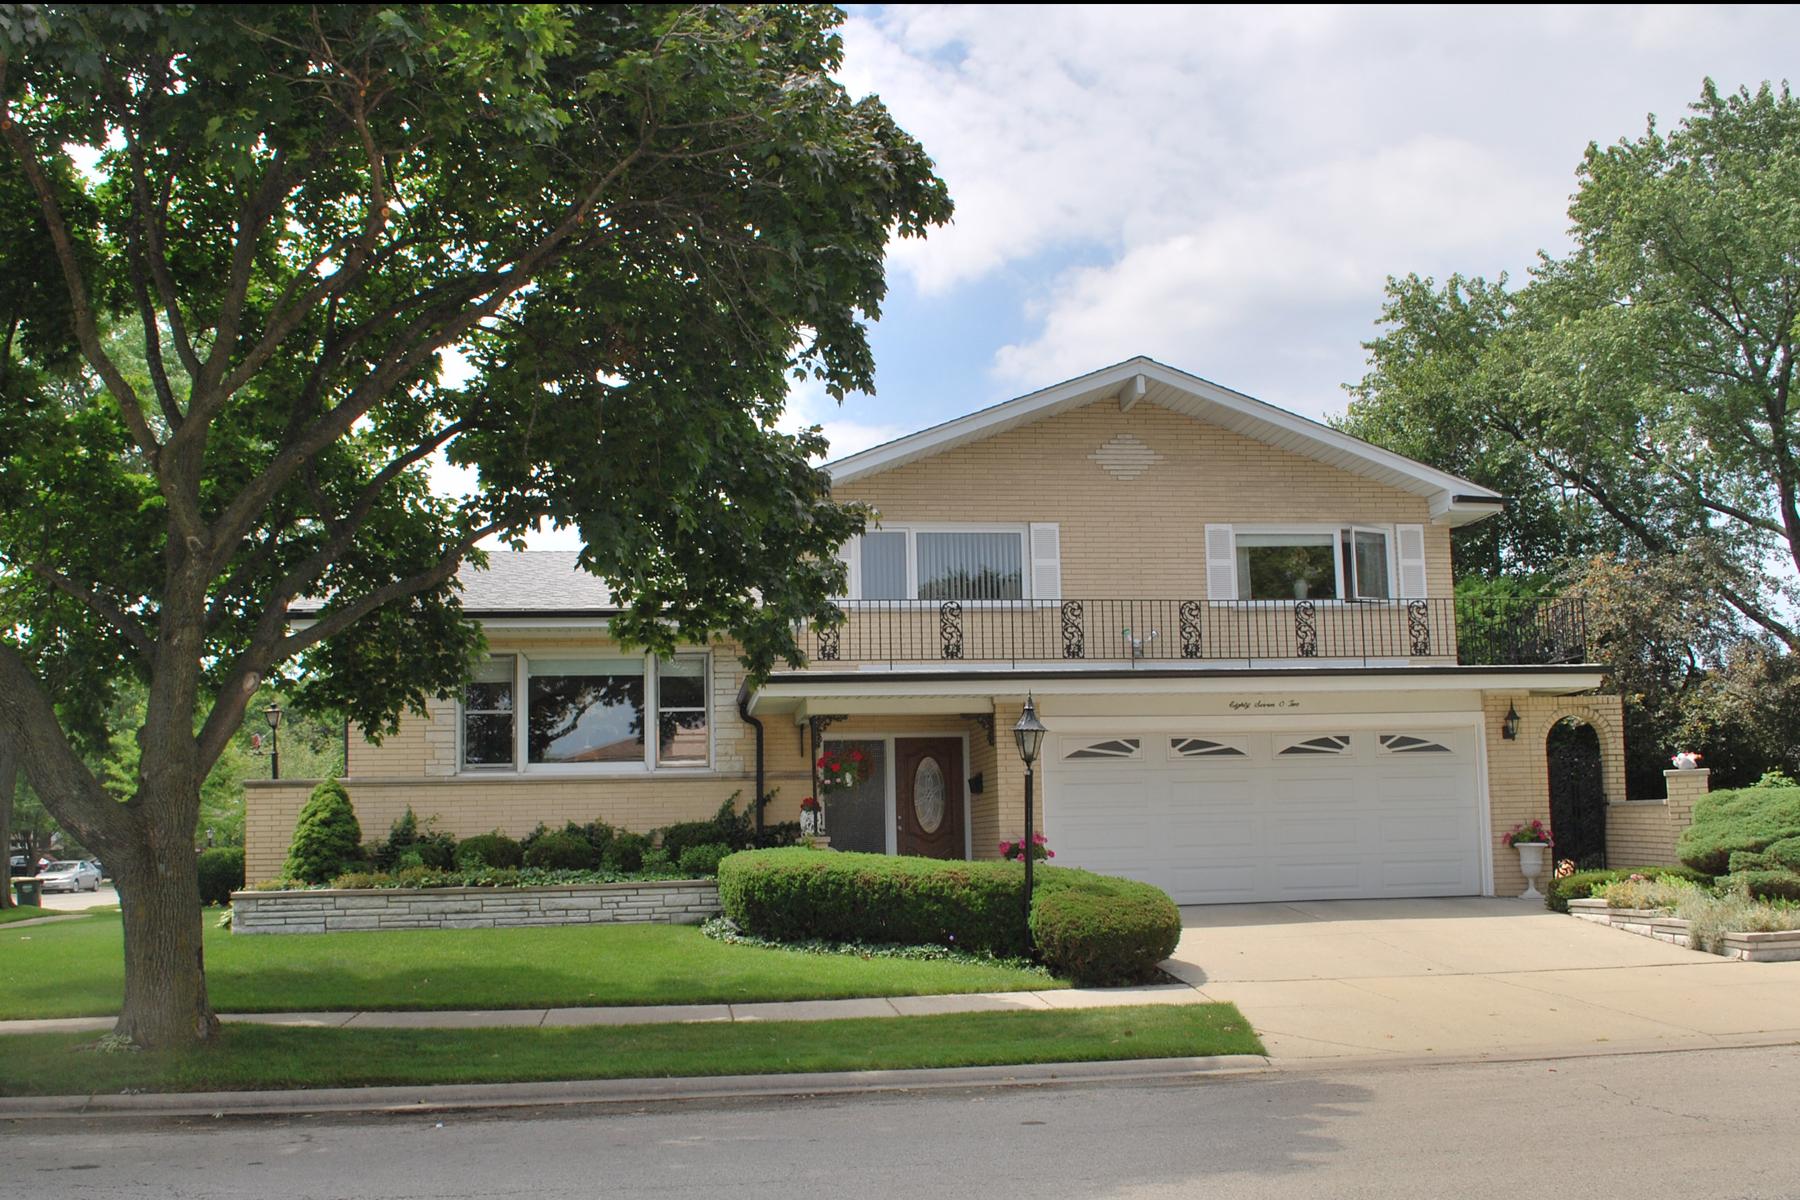 8702 W. Madison Drive, Niles, Illinois 60714